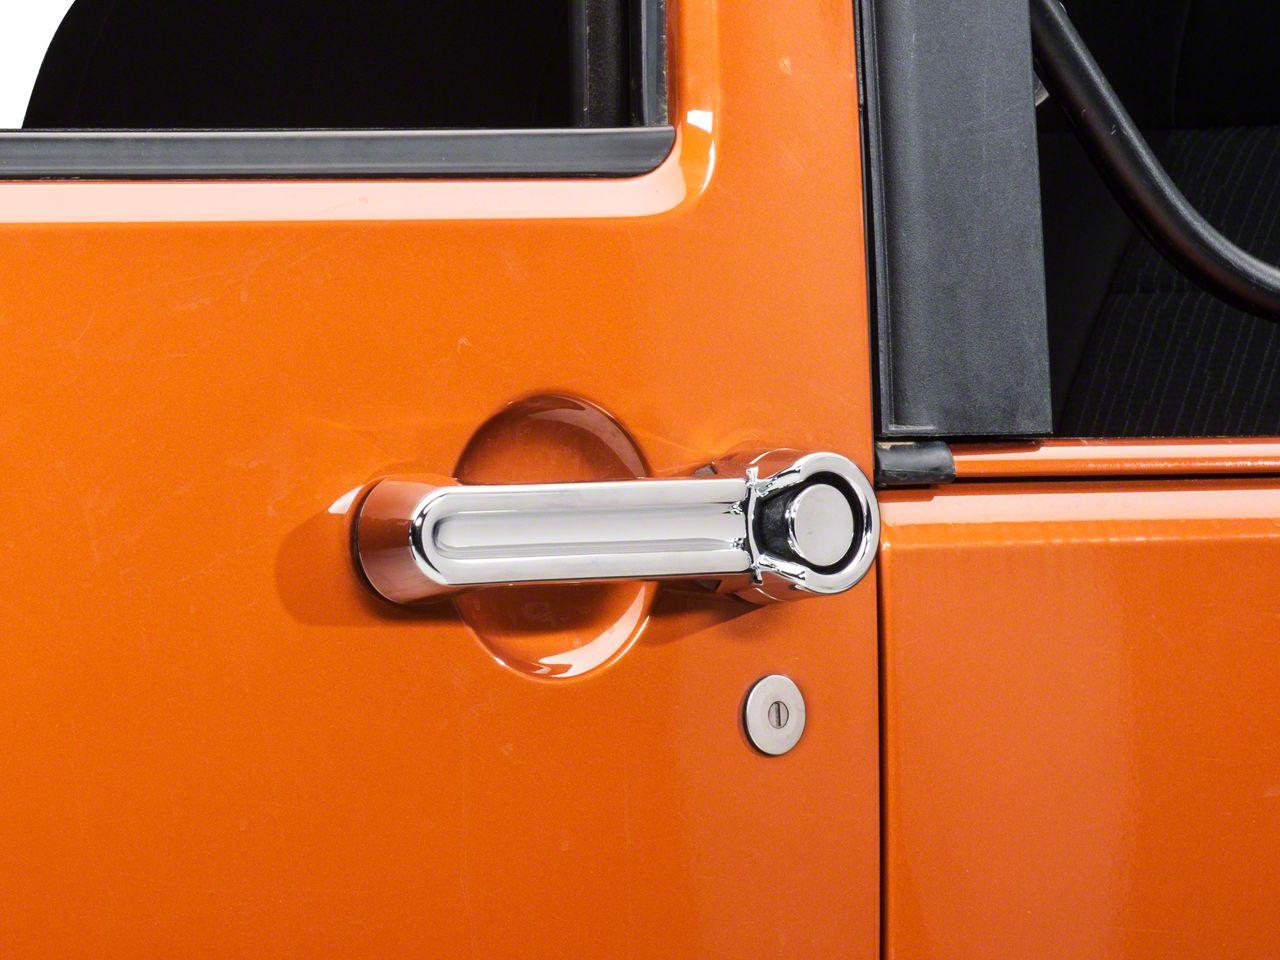 Chrome Door Handle Covers 2-Pc Set Fits 2007-2018 Jeep Wrangler JK